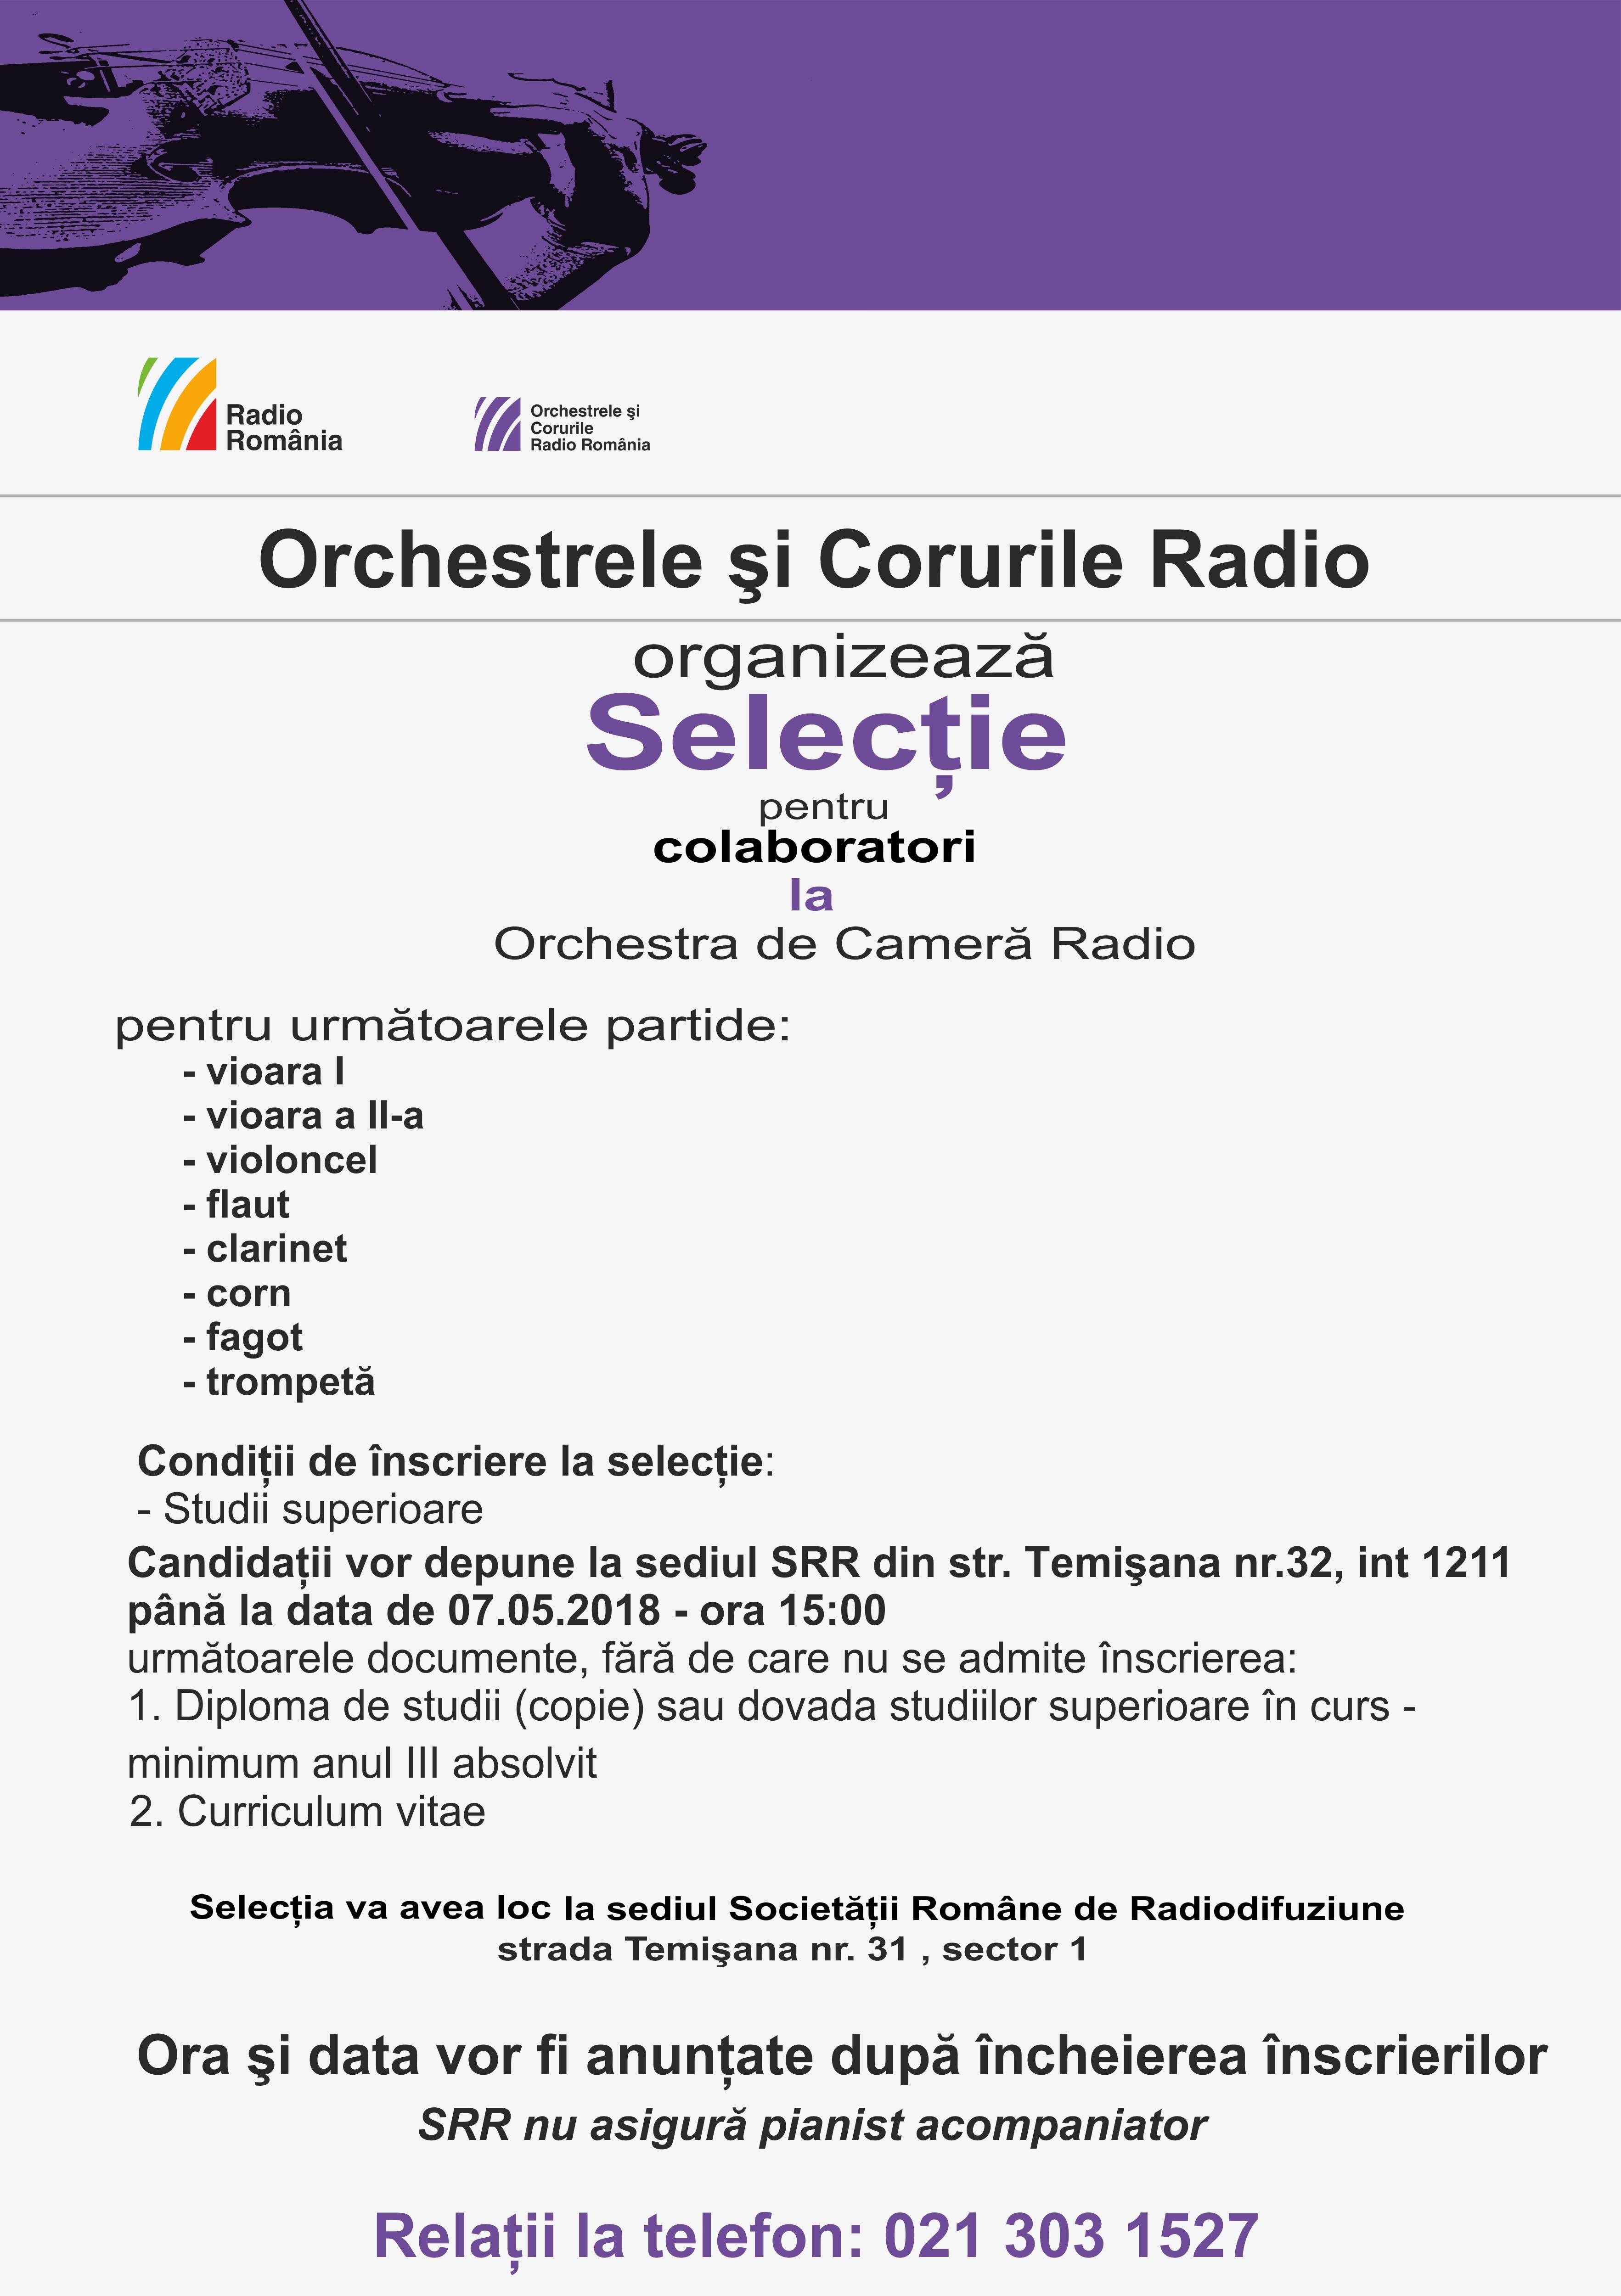 Selecţie colaboratori la Orchestra de Cameră Radio